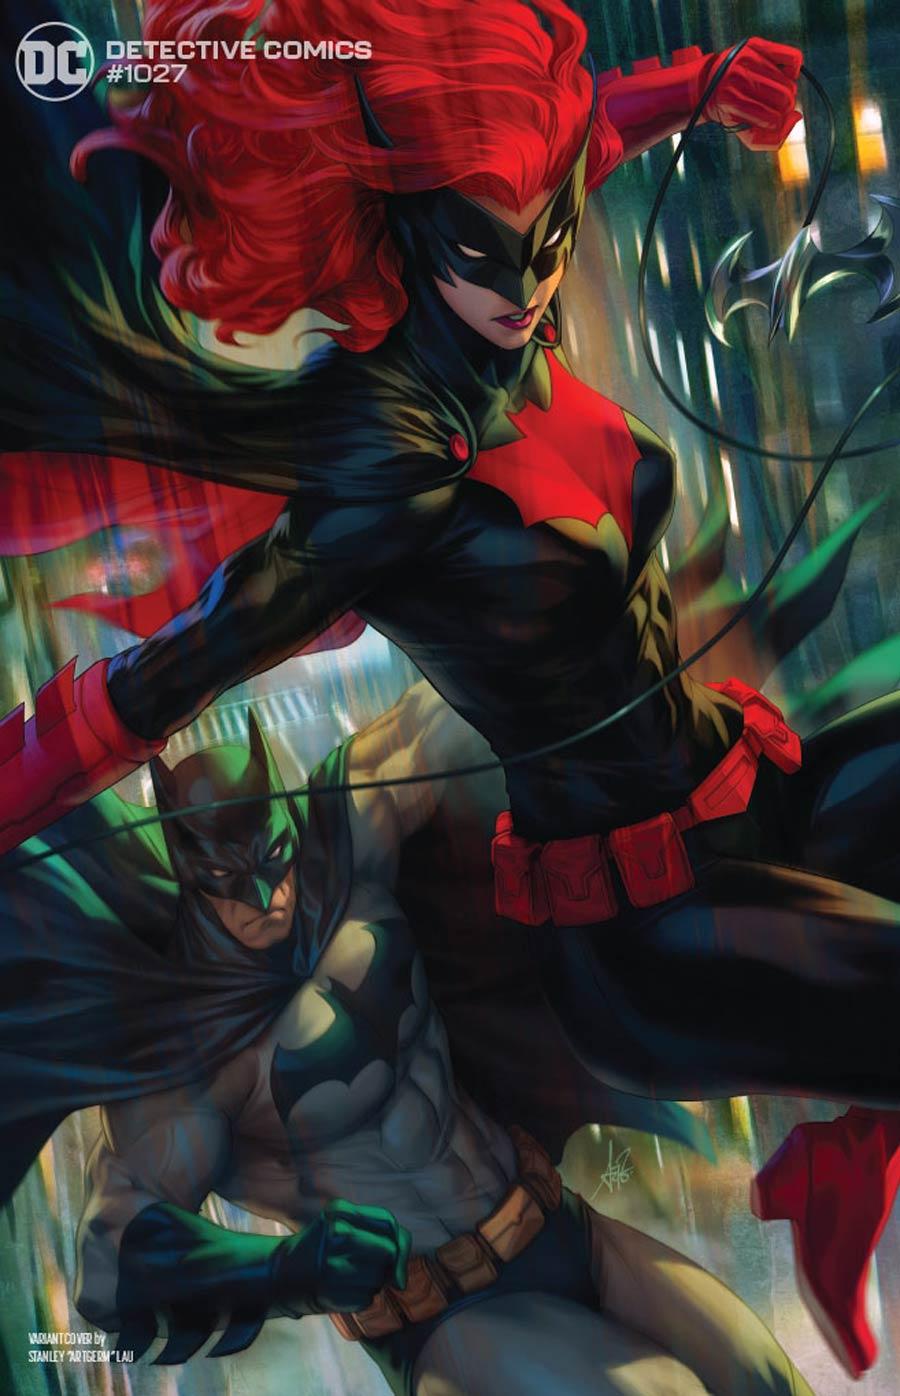 Detective Comics Vol 2 #1027 Cover D Variant Stanley Artgerm Lau Batman & Batwoman Cover